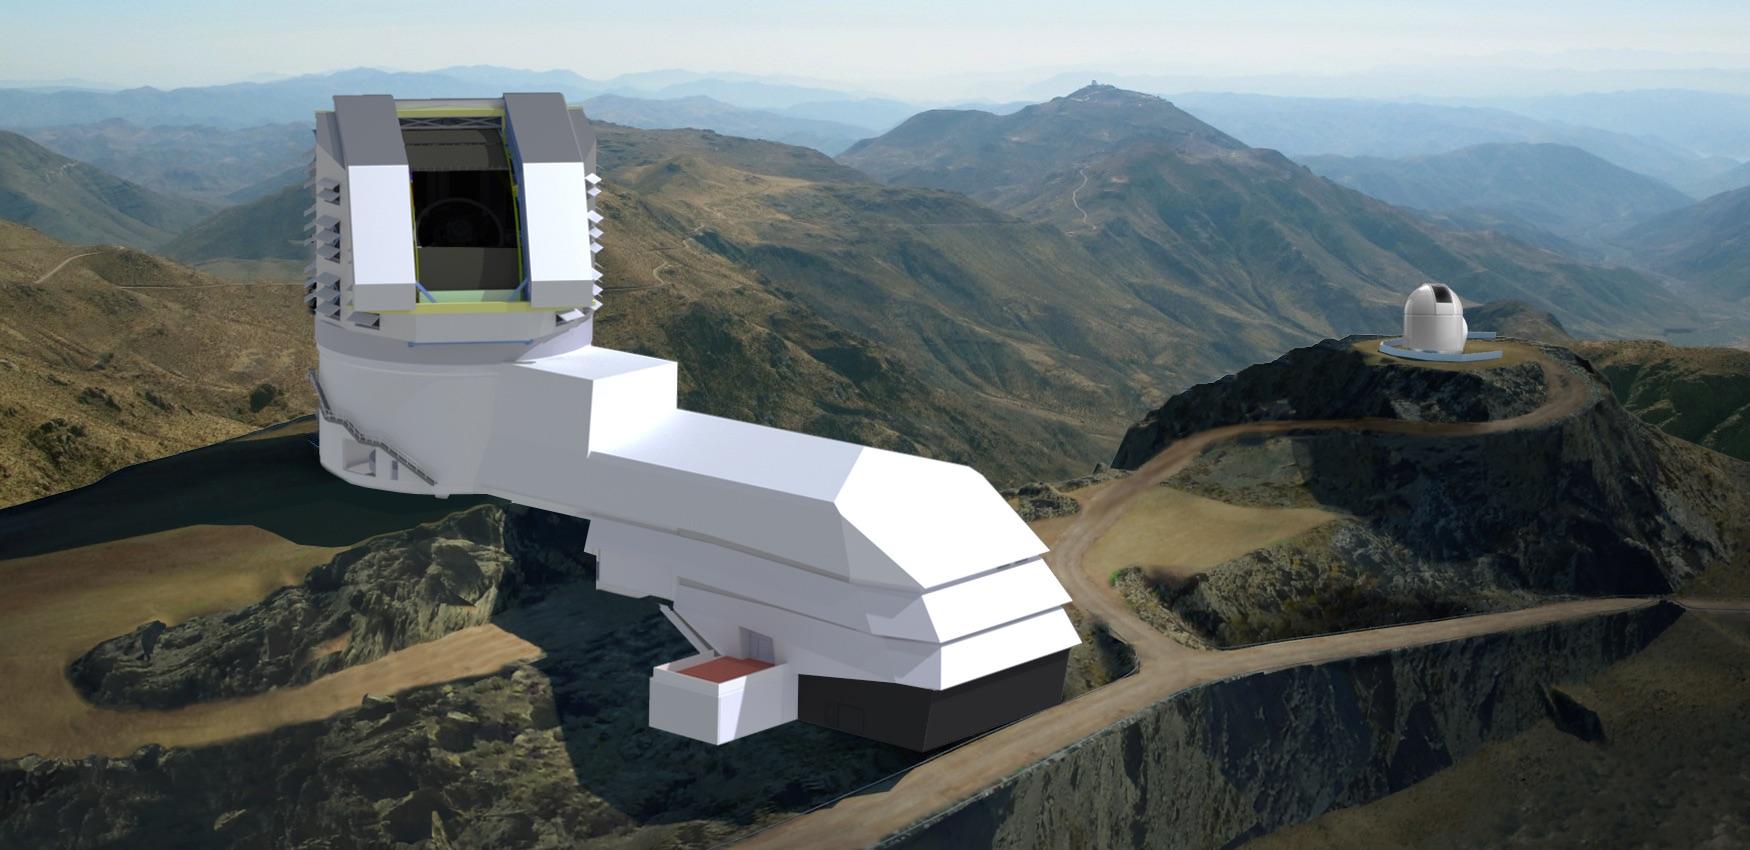 DSC-FT1119 06 Large Synoptic Survey Telescope rendering